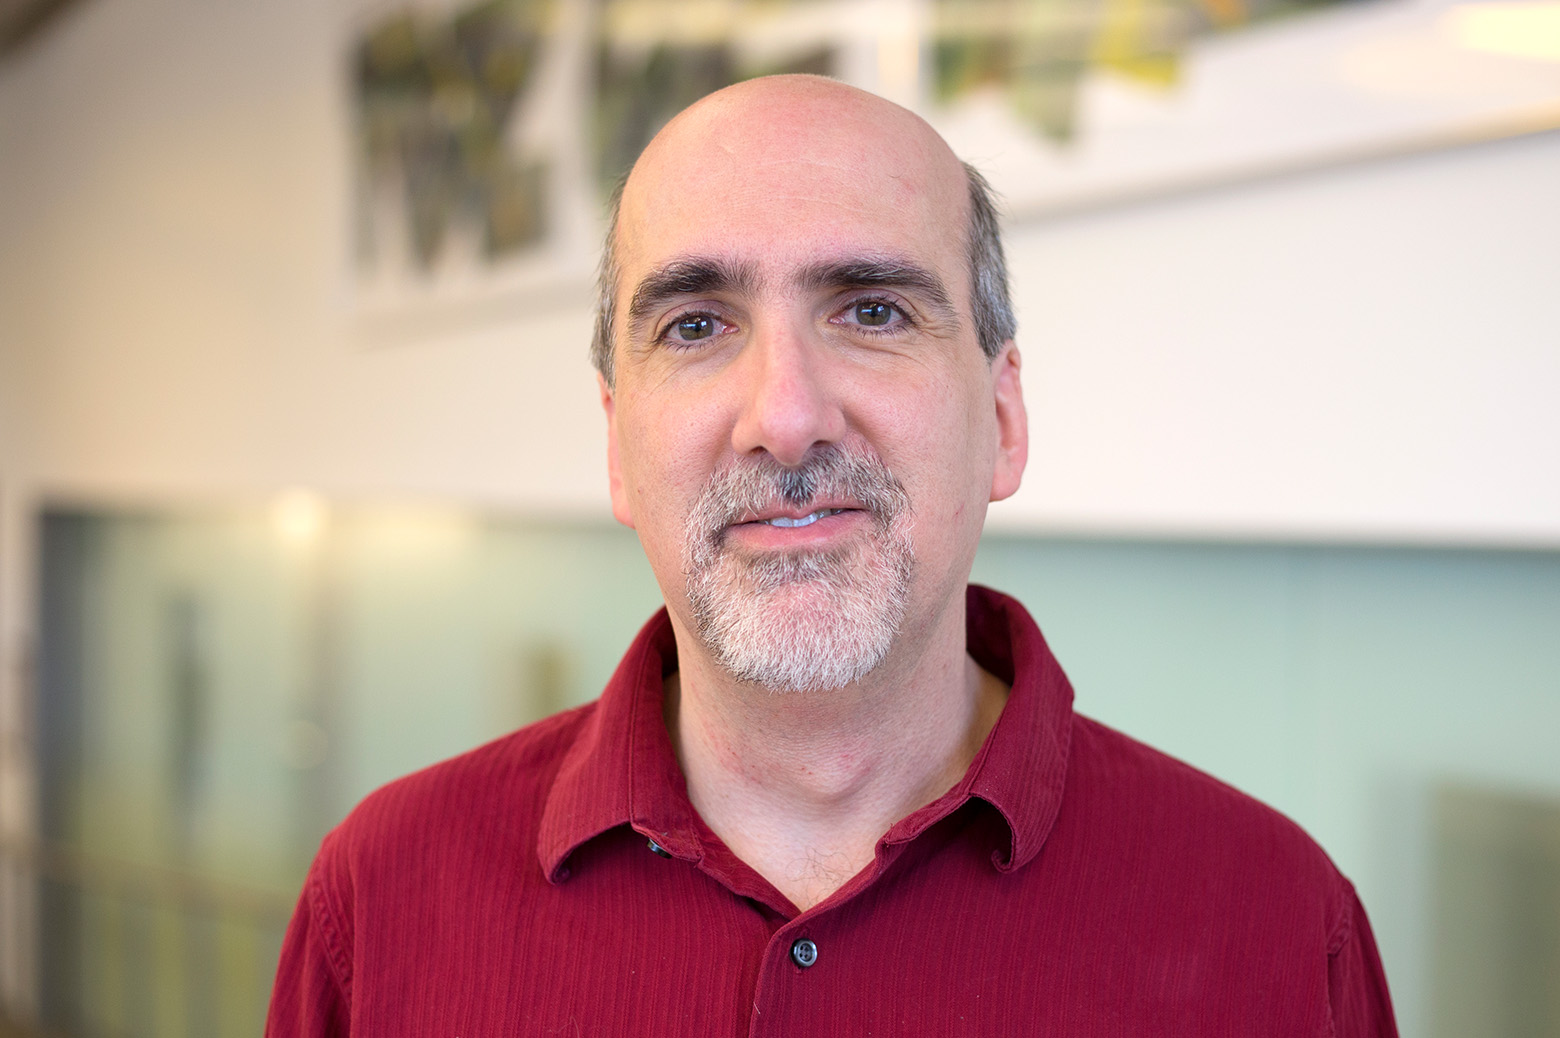 Prof. David Paoletti